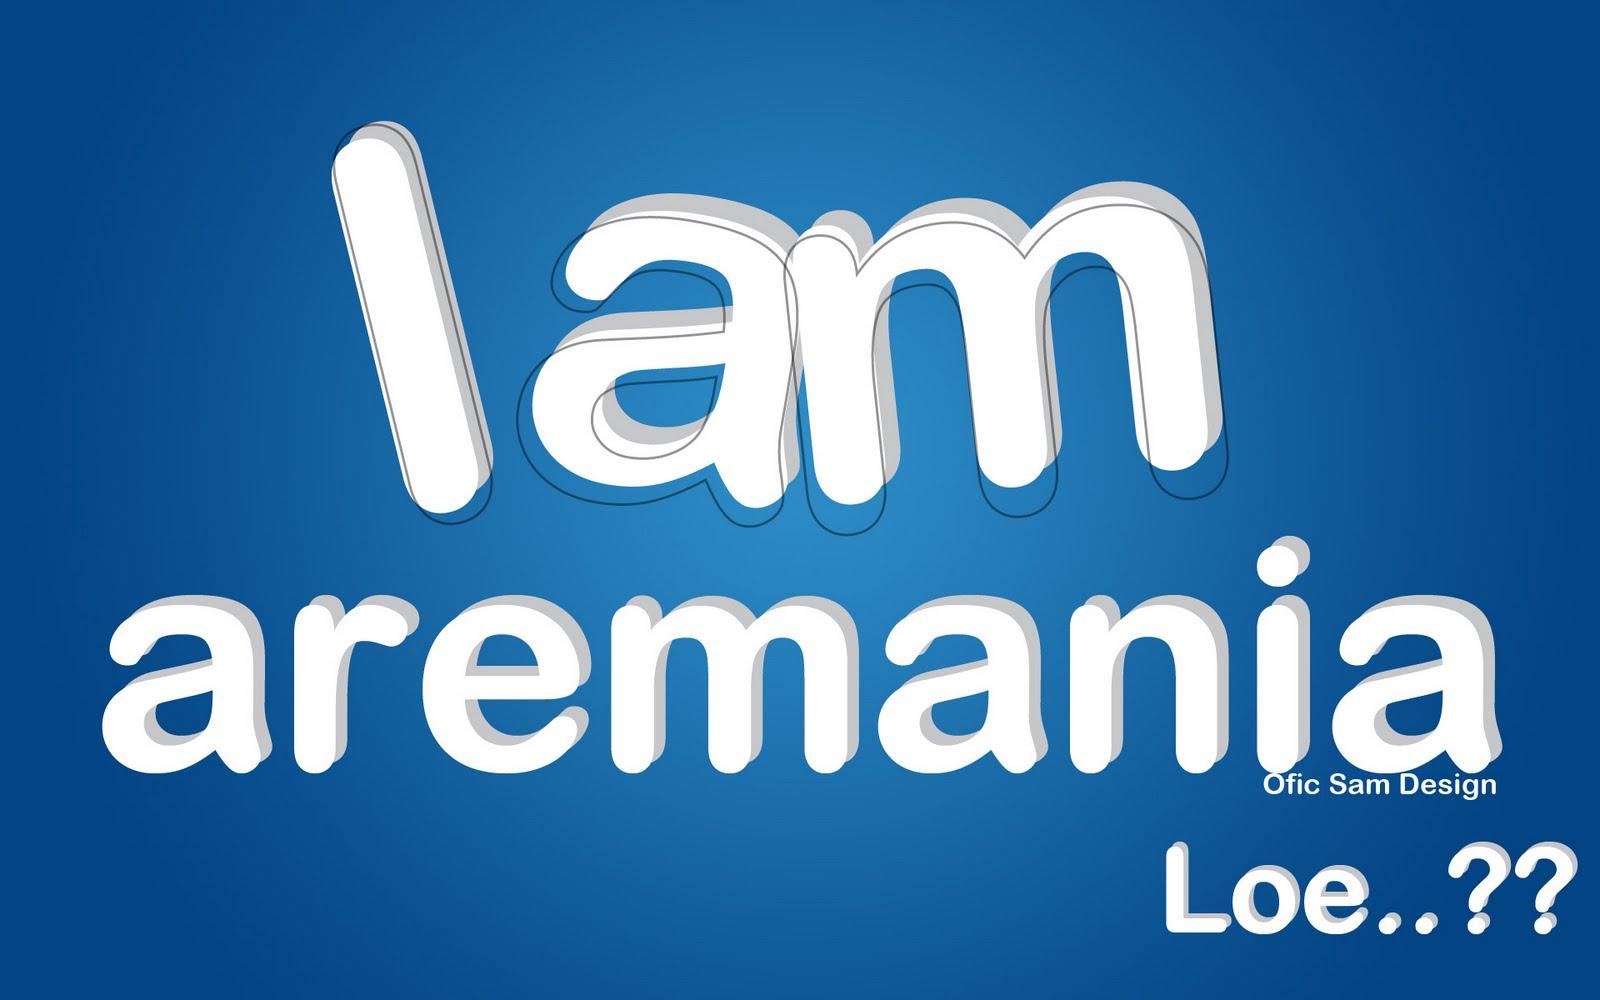 http://3.bp.blogspot.com/-i6dznIeiL0U/Tl9YAcSjcTI/AAAAAAAAAhY/MvnoTePDOf8/s1600/Ofic+sam+design+-+partner+AREMA+INDONESIA+wallpapers+-+I+am+aremania.jpg